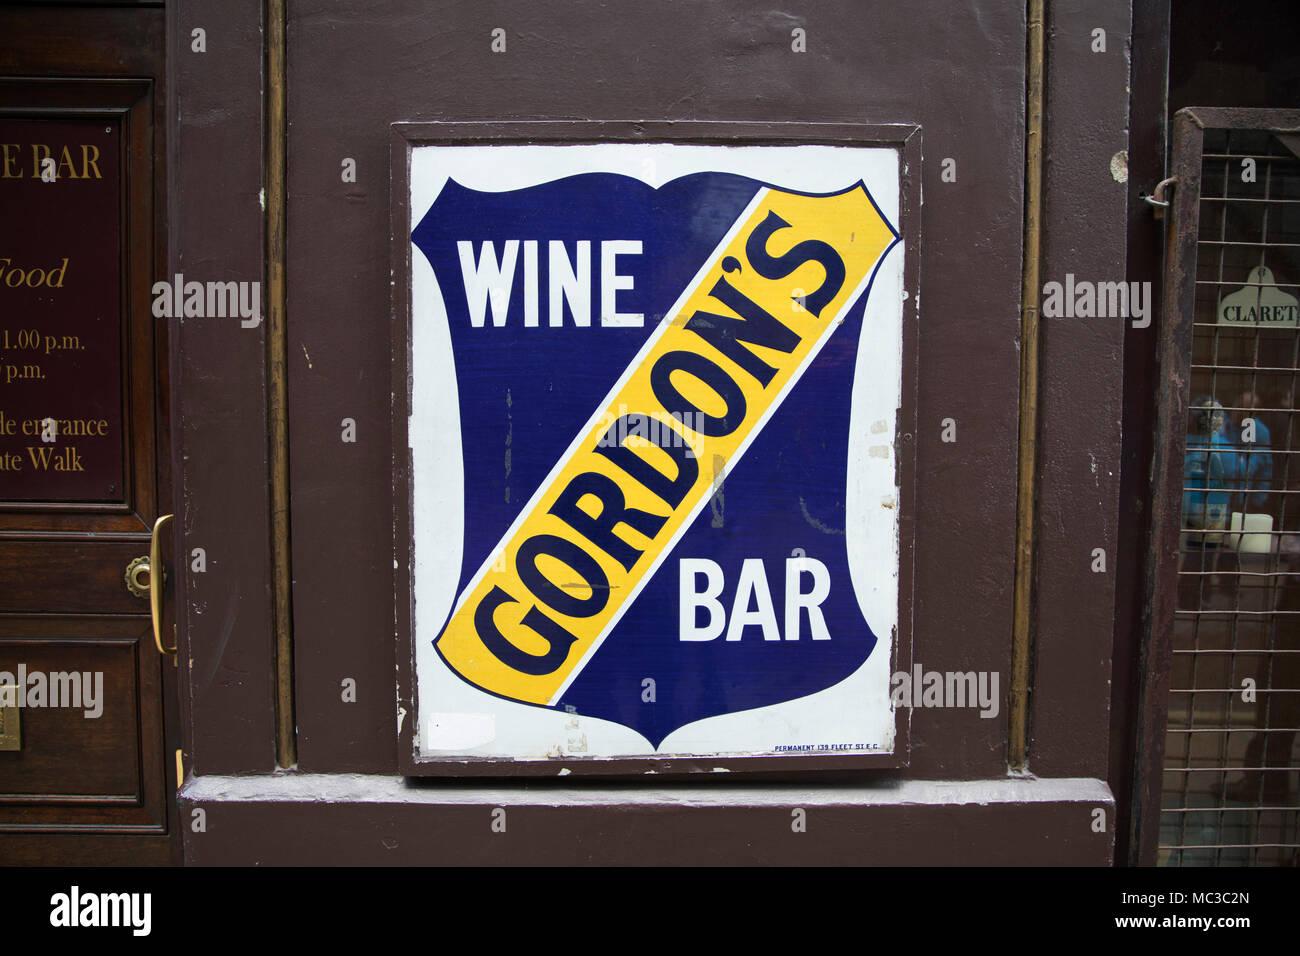 Gordons Bar Stockfotos & Gordons Bar Bilder - Alamy